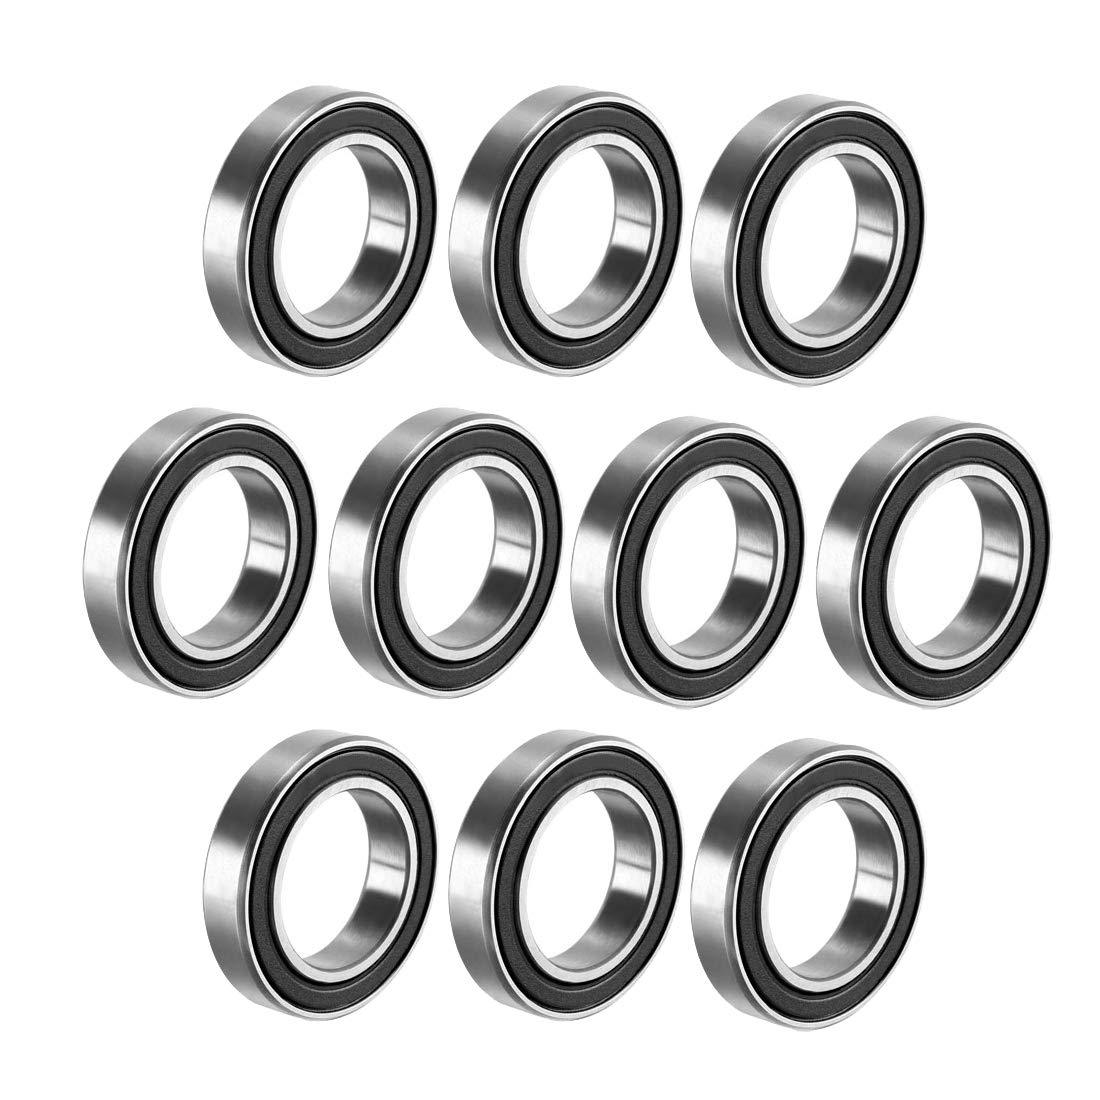 10 Pcs Premium 6802 2RS ABEC3 Rubber Sealed Deep Groove Ball Bearing 15x24x5mm